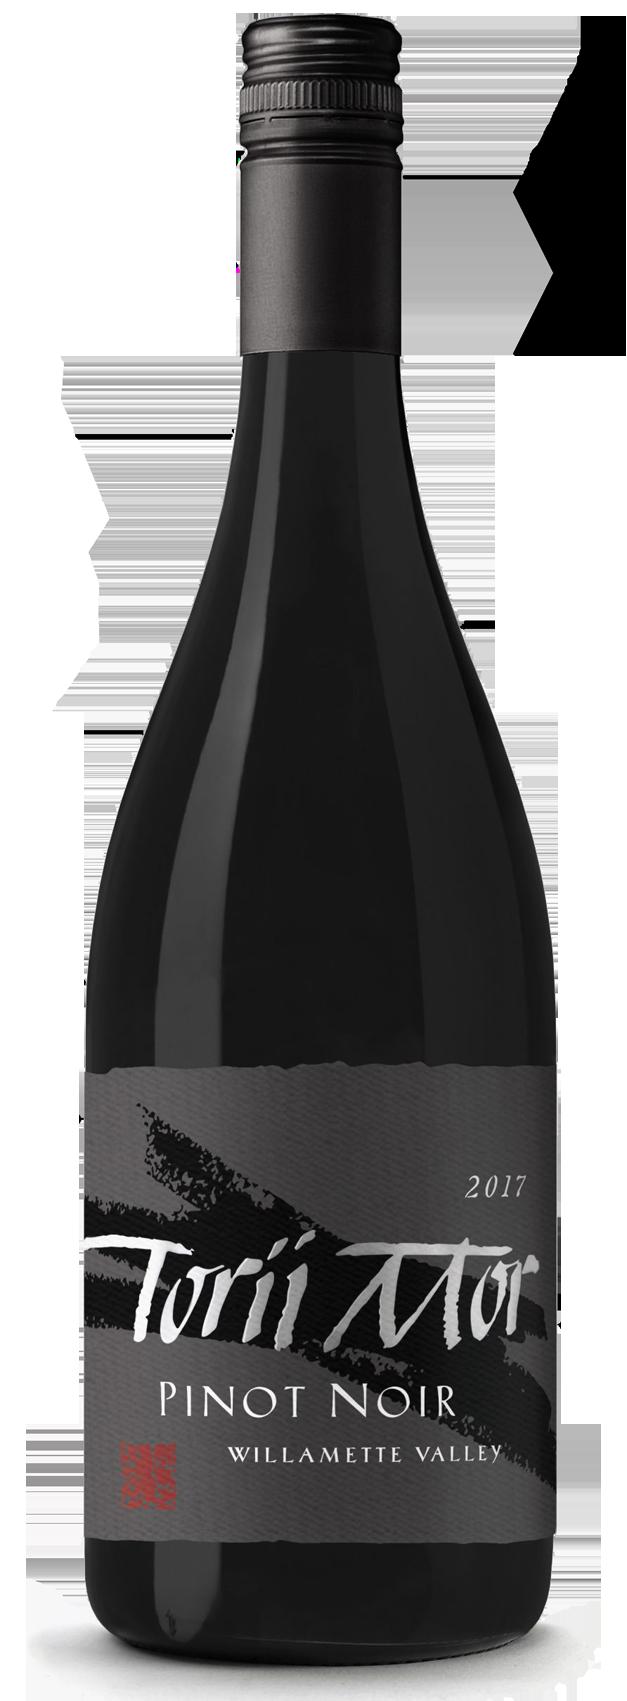 Torii Mor Pinot Noir